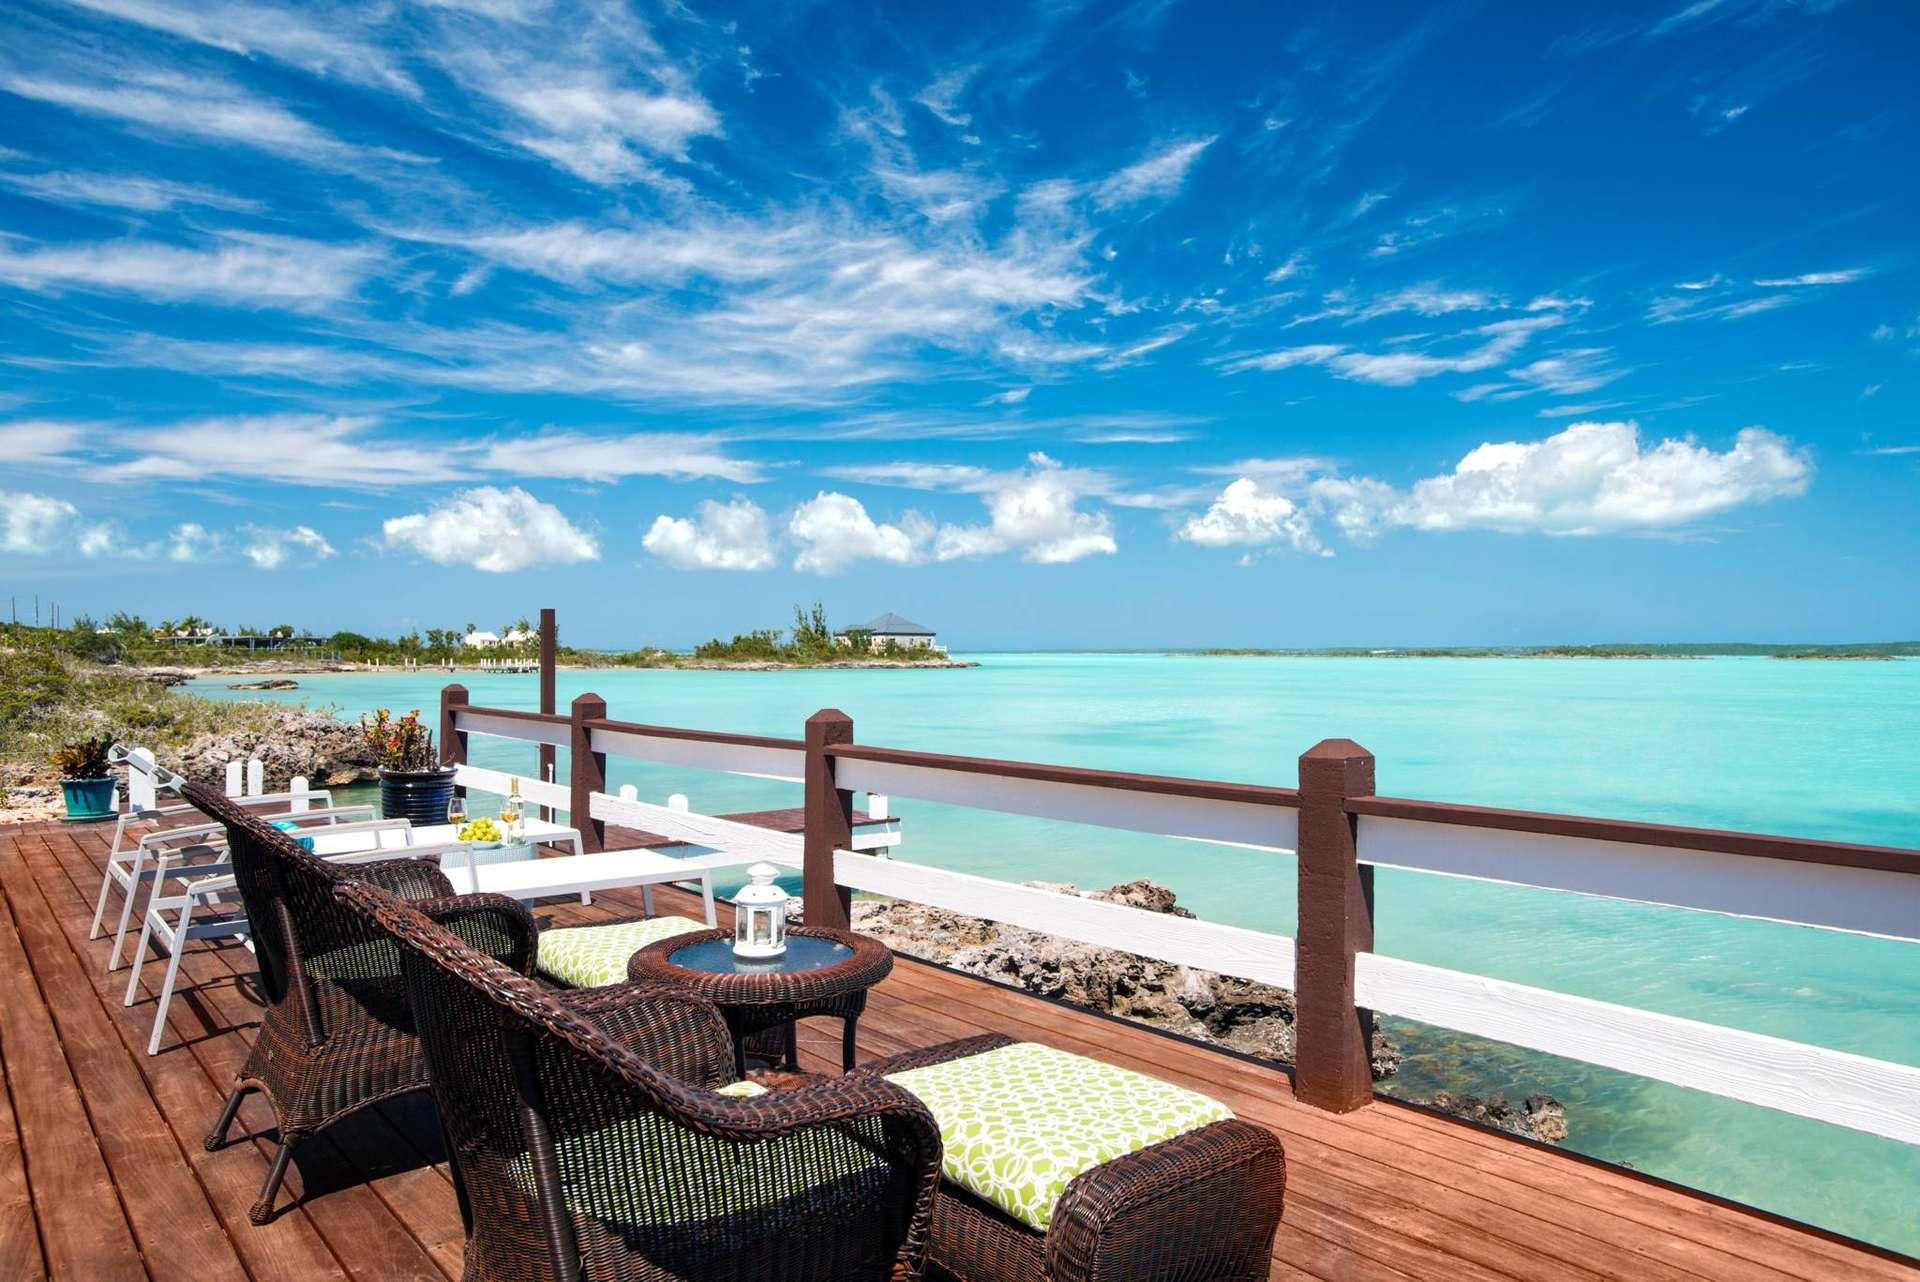 Luxury villa rentals caribbean - Turks and caicos - Providenciales - Chalk sound - Bashert - Image 1/18